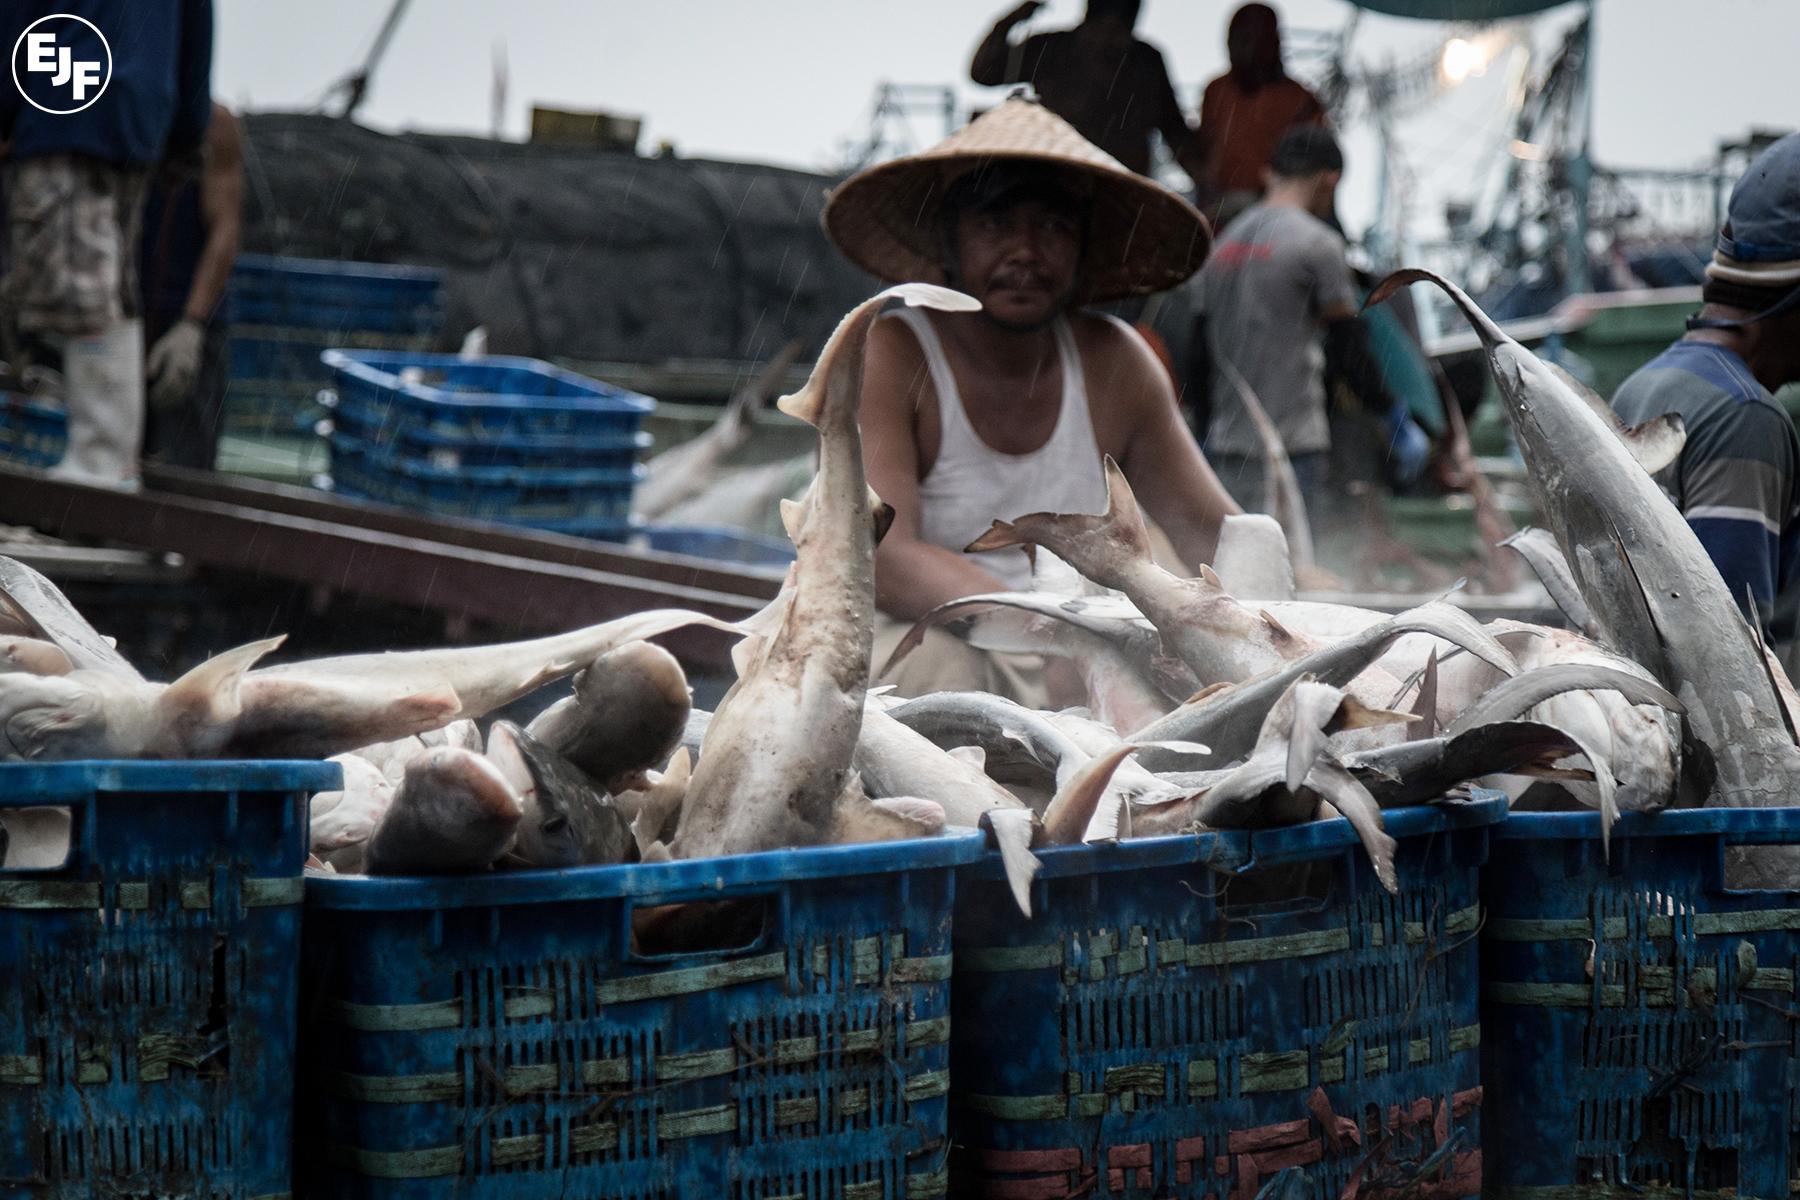 indonesia-sharks.jpg#asset:2048